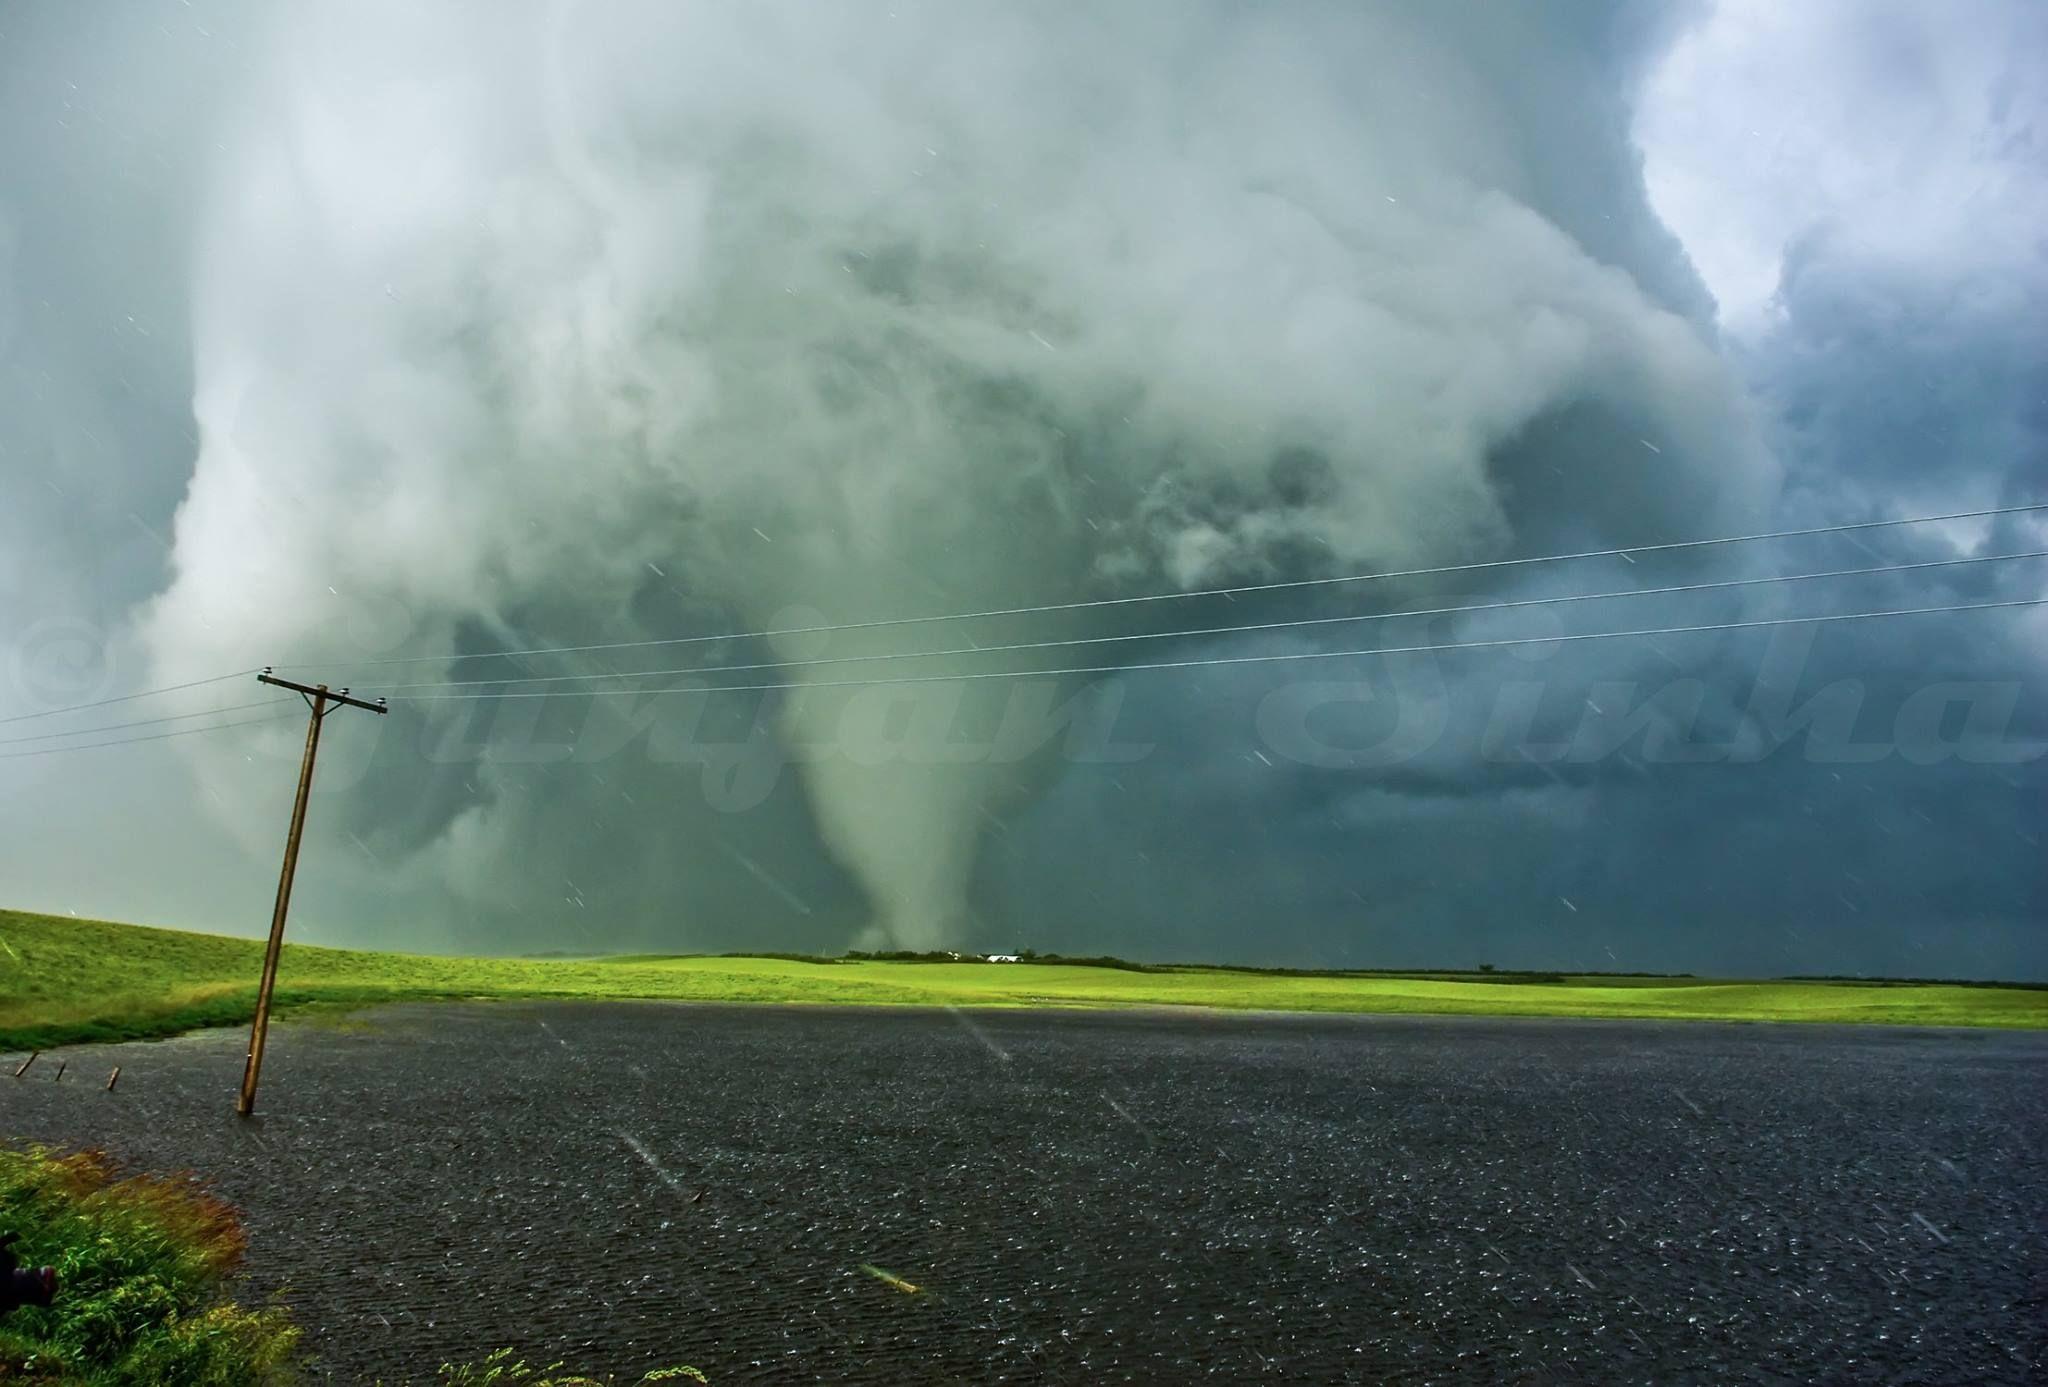 Tornado south of Moose Jaw, Saskatchewan (Canada) on June